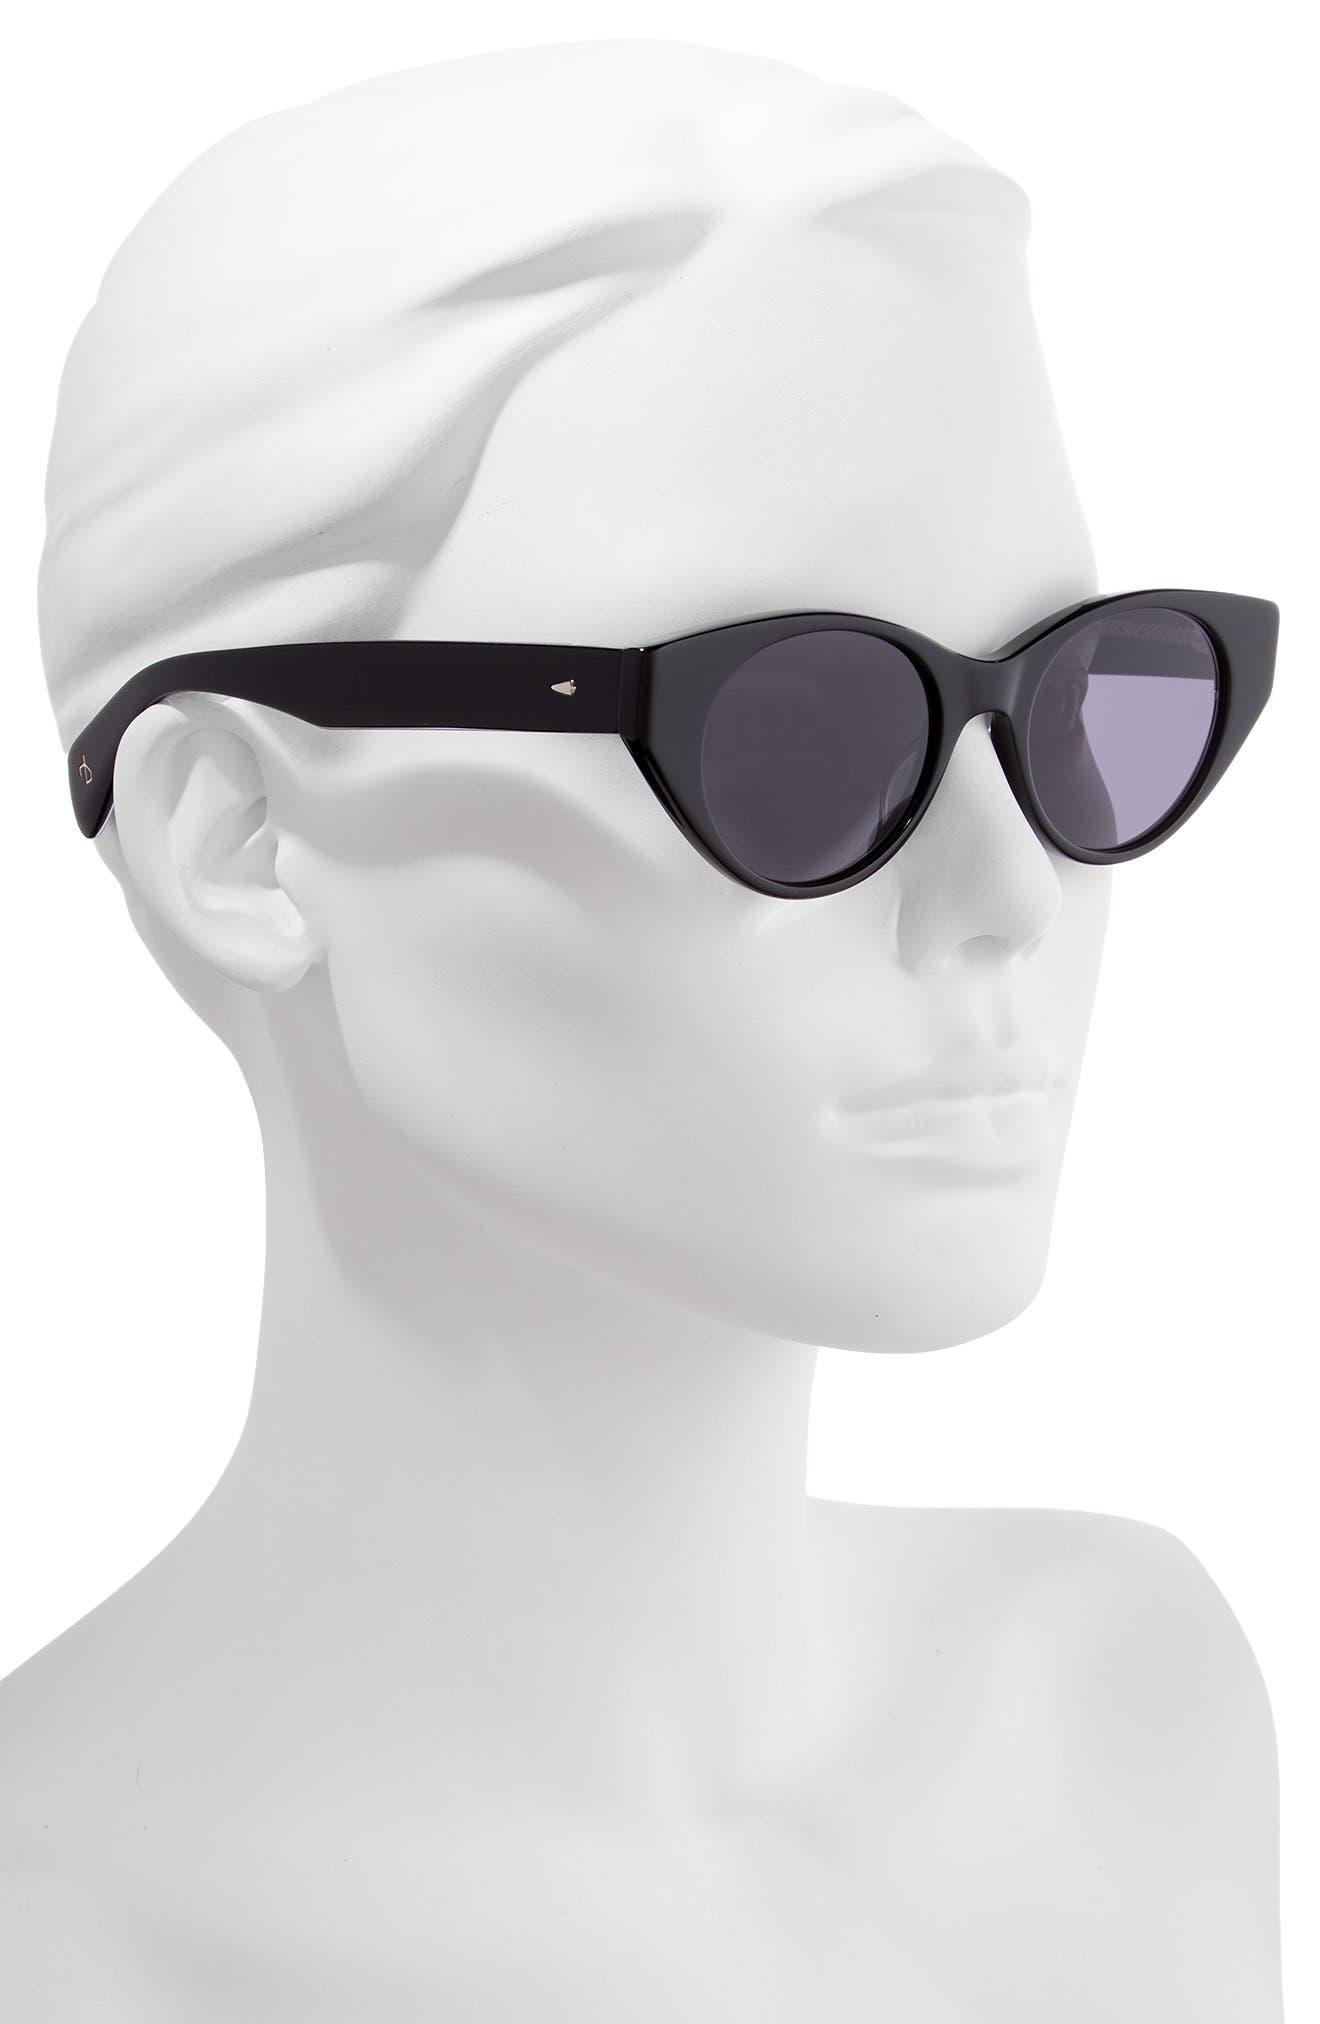 49mm Cat Eye Sunglasses,                             Alternate thumbnail 2, color,                             BLACK